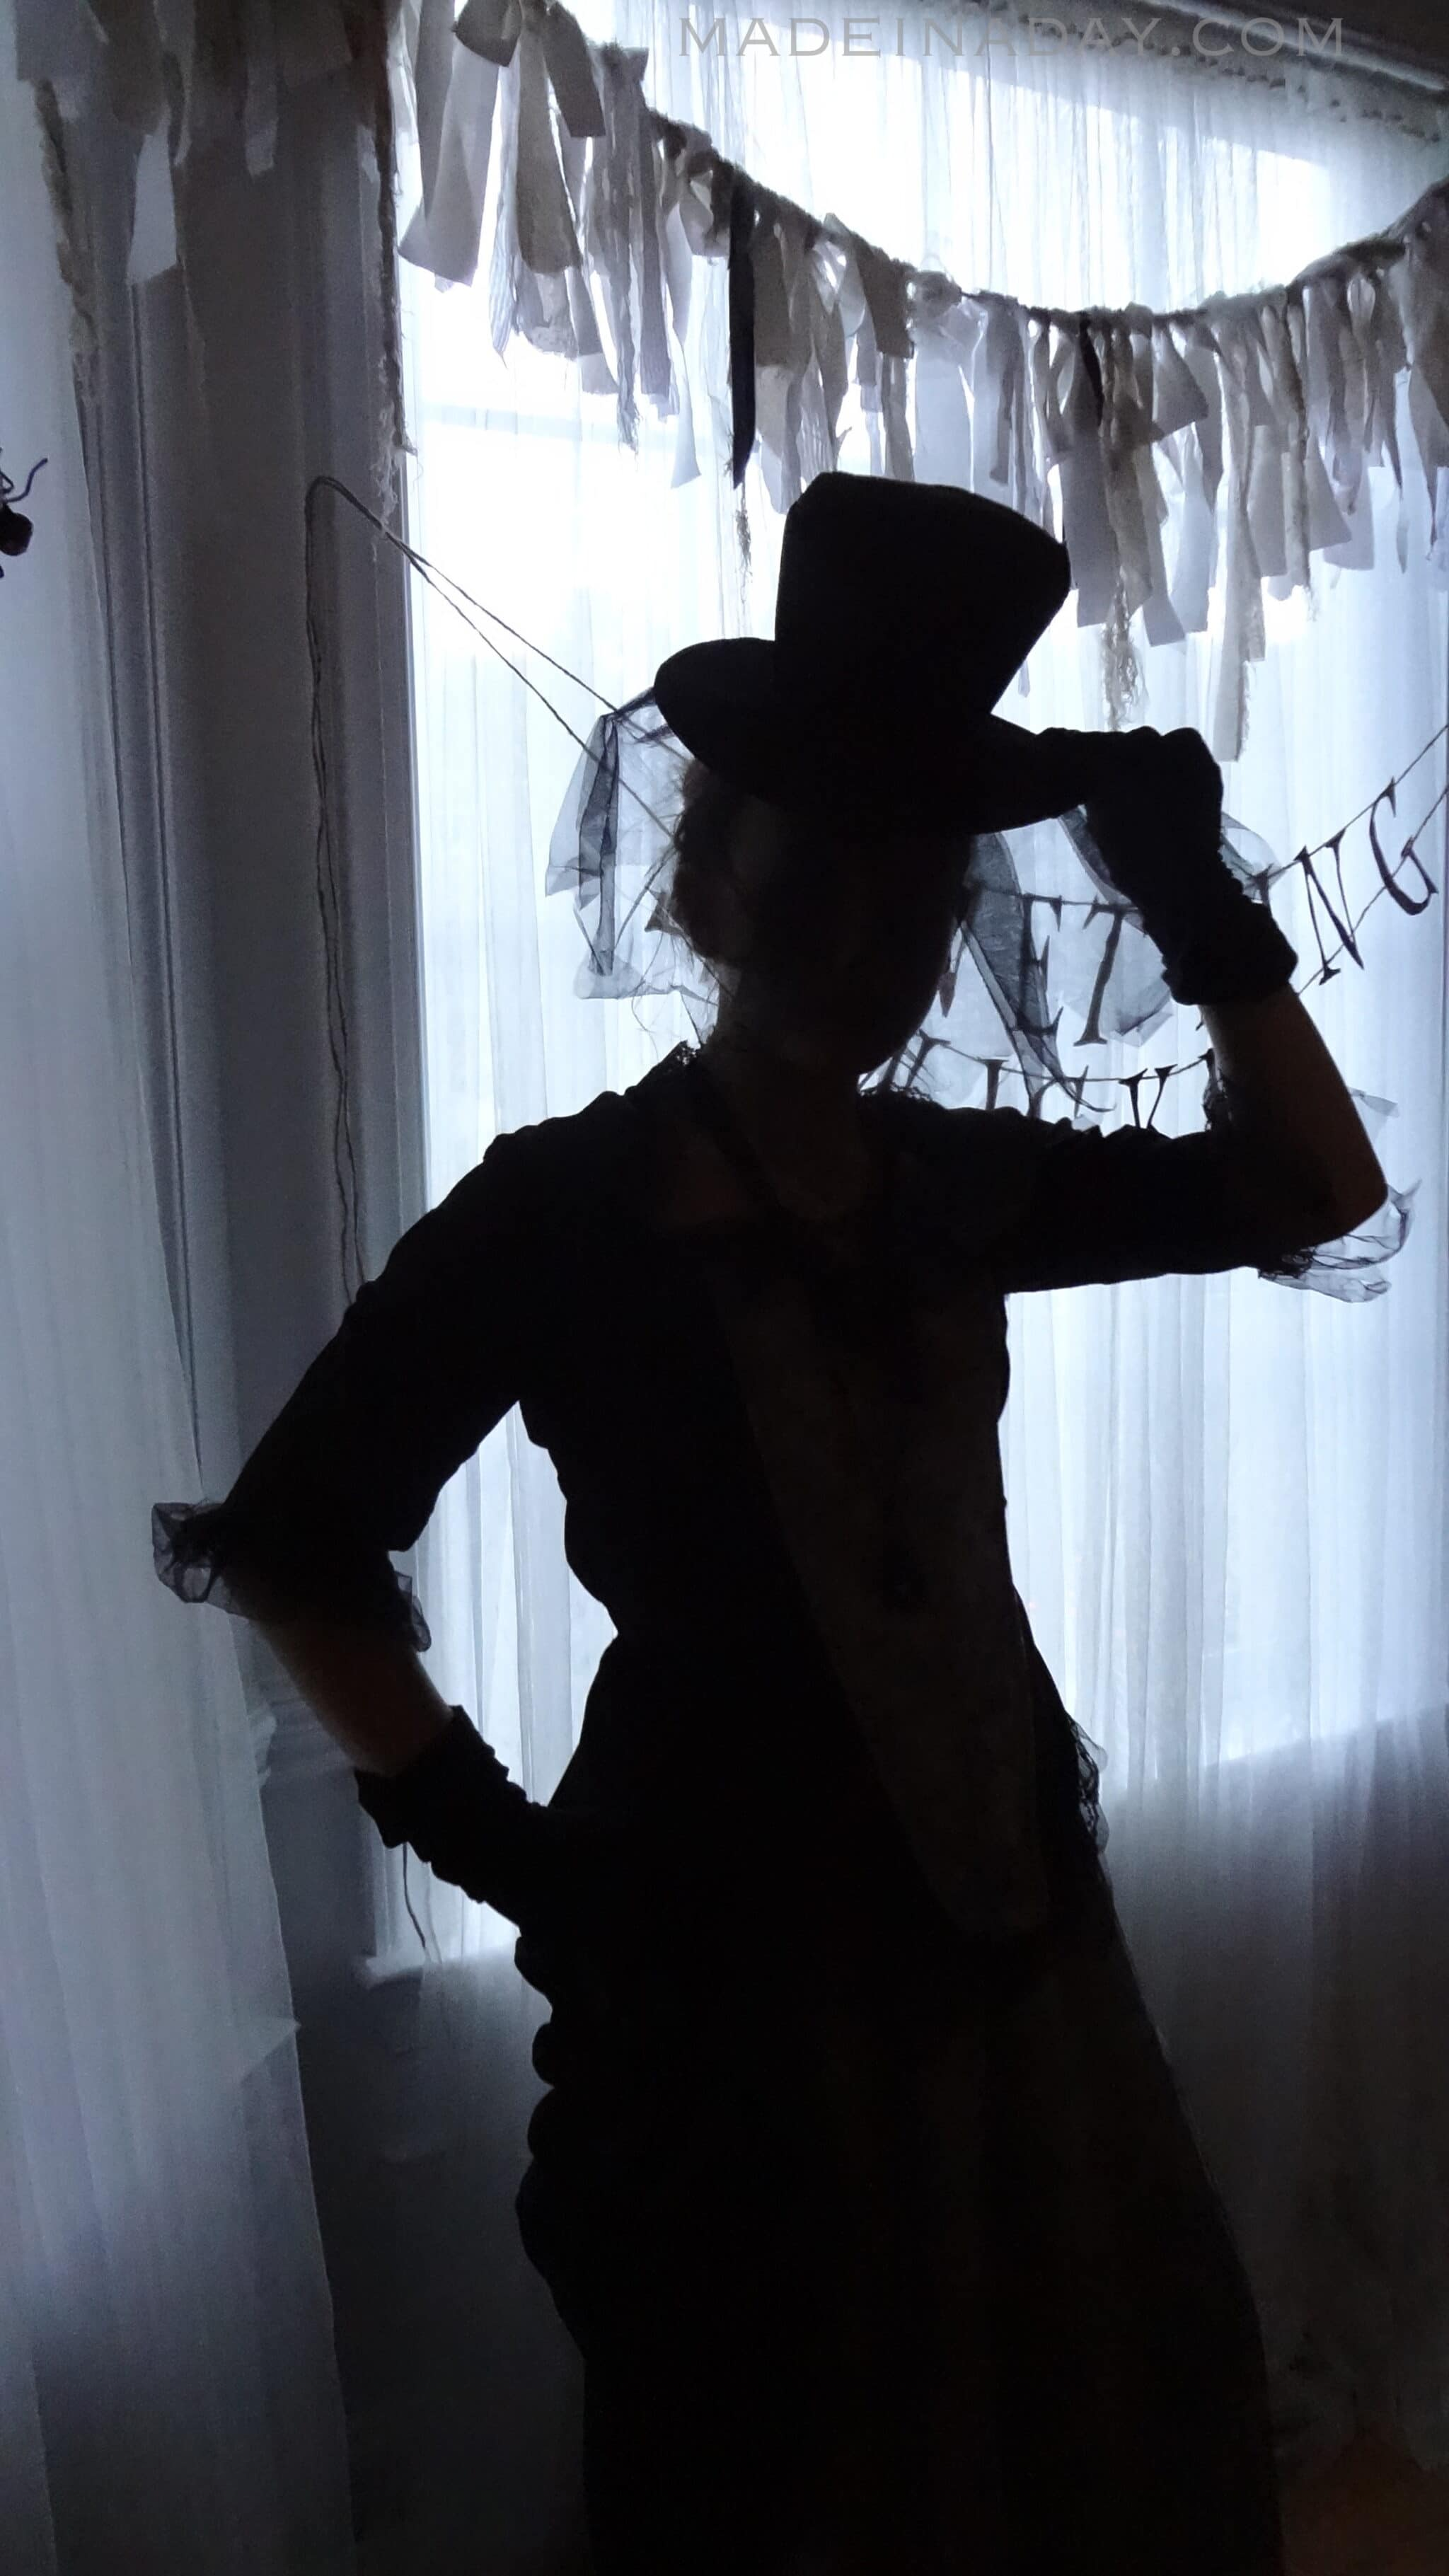 Spooky Silhouette Halloween Costume